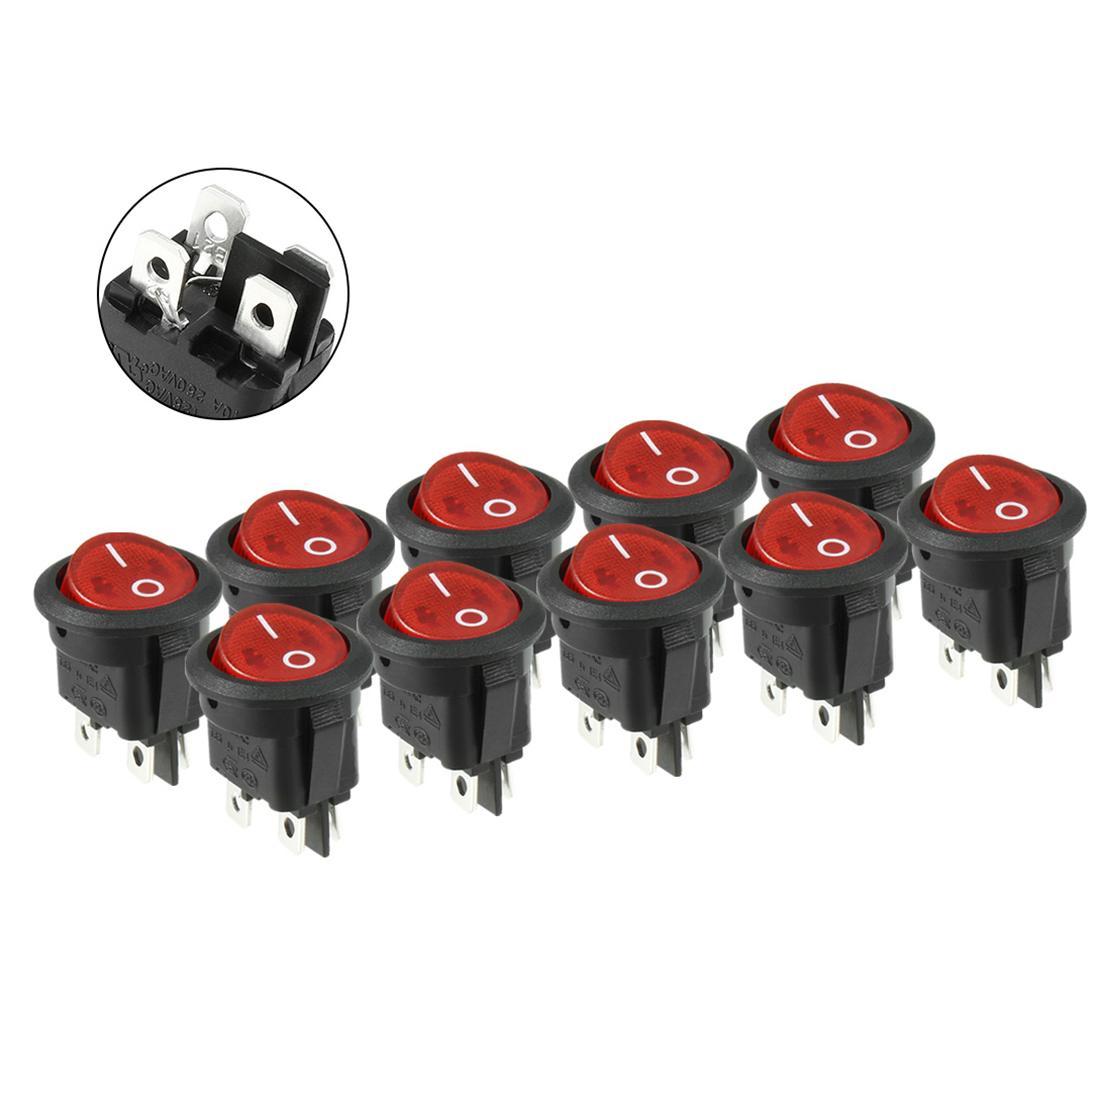 10pcs AC 6A/250V 10A/125V DPST Rocker Switch Red Light Illuminated